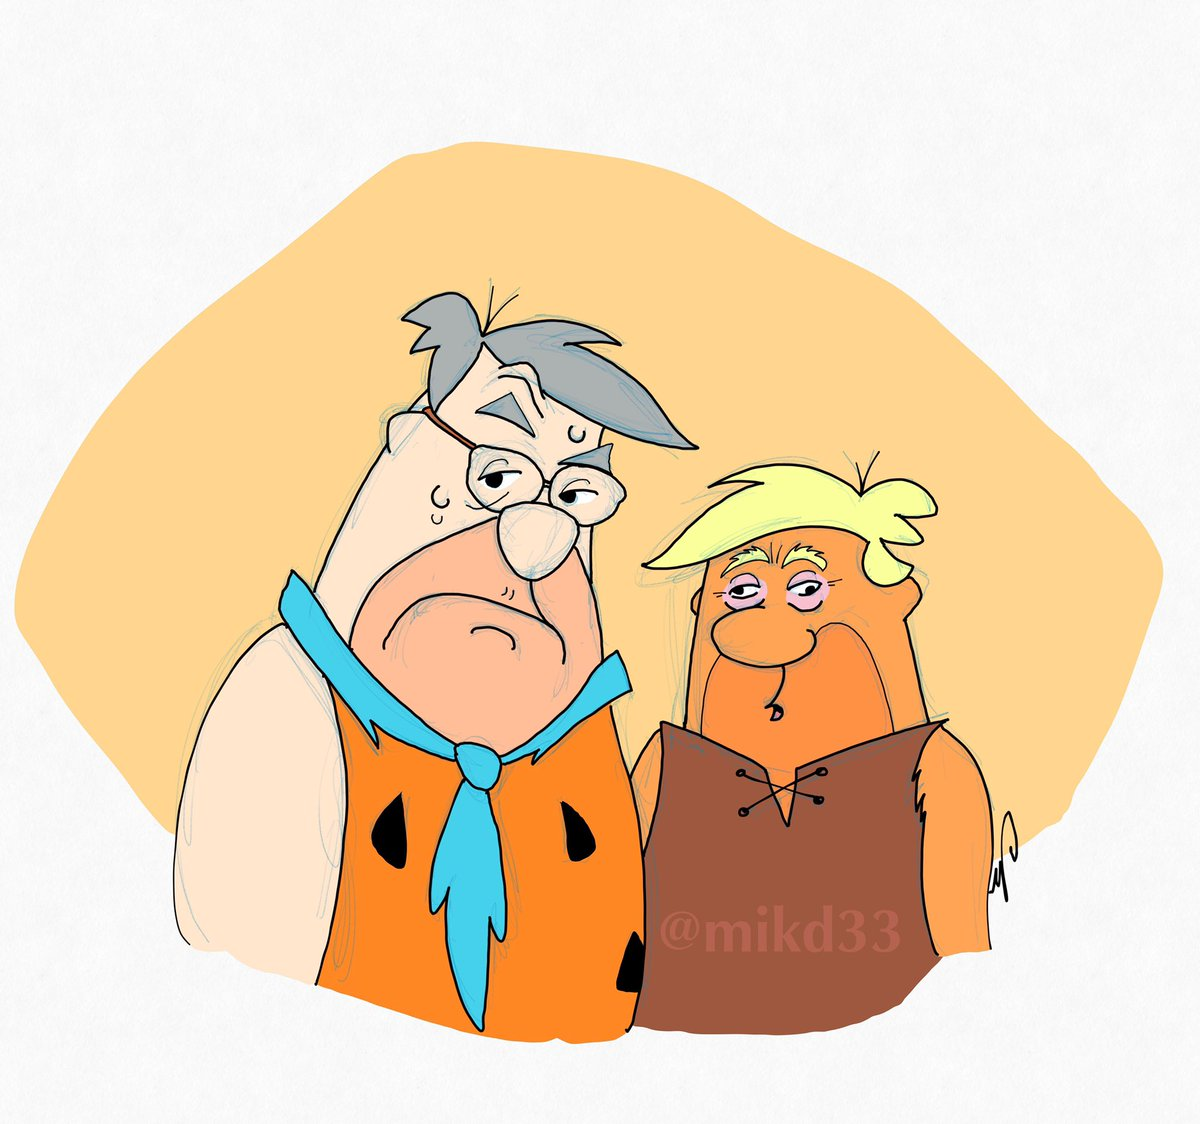 Barr / Trump